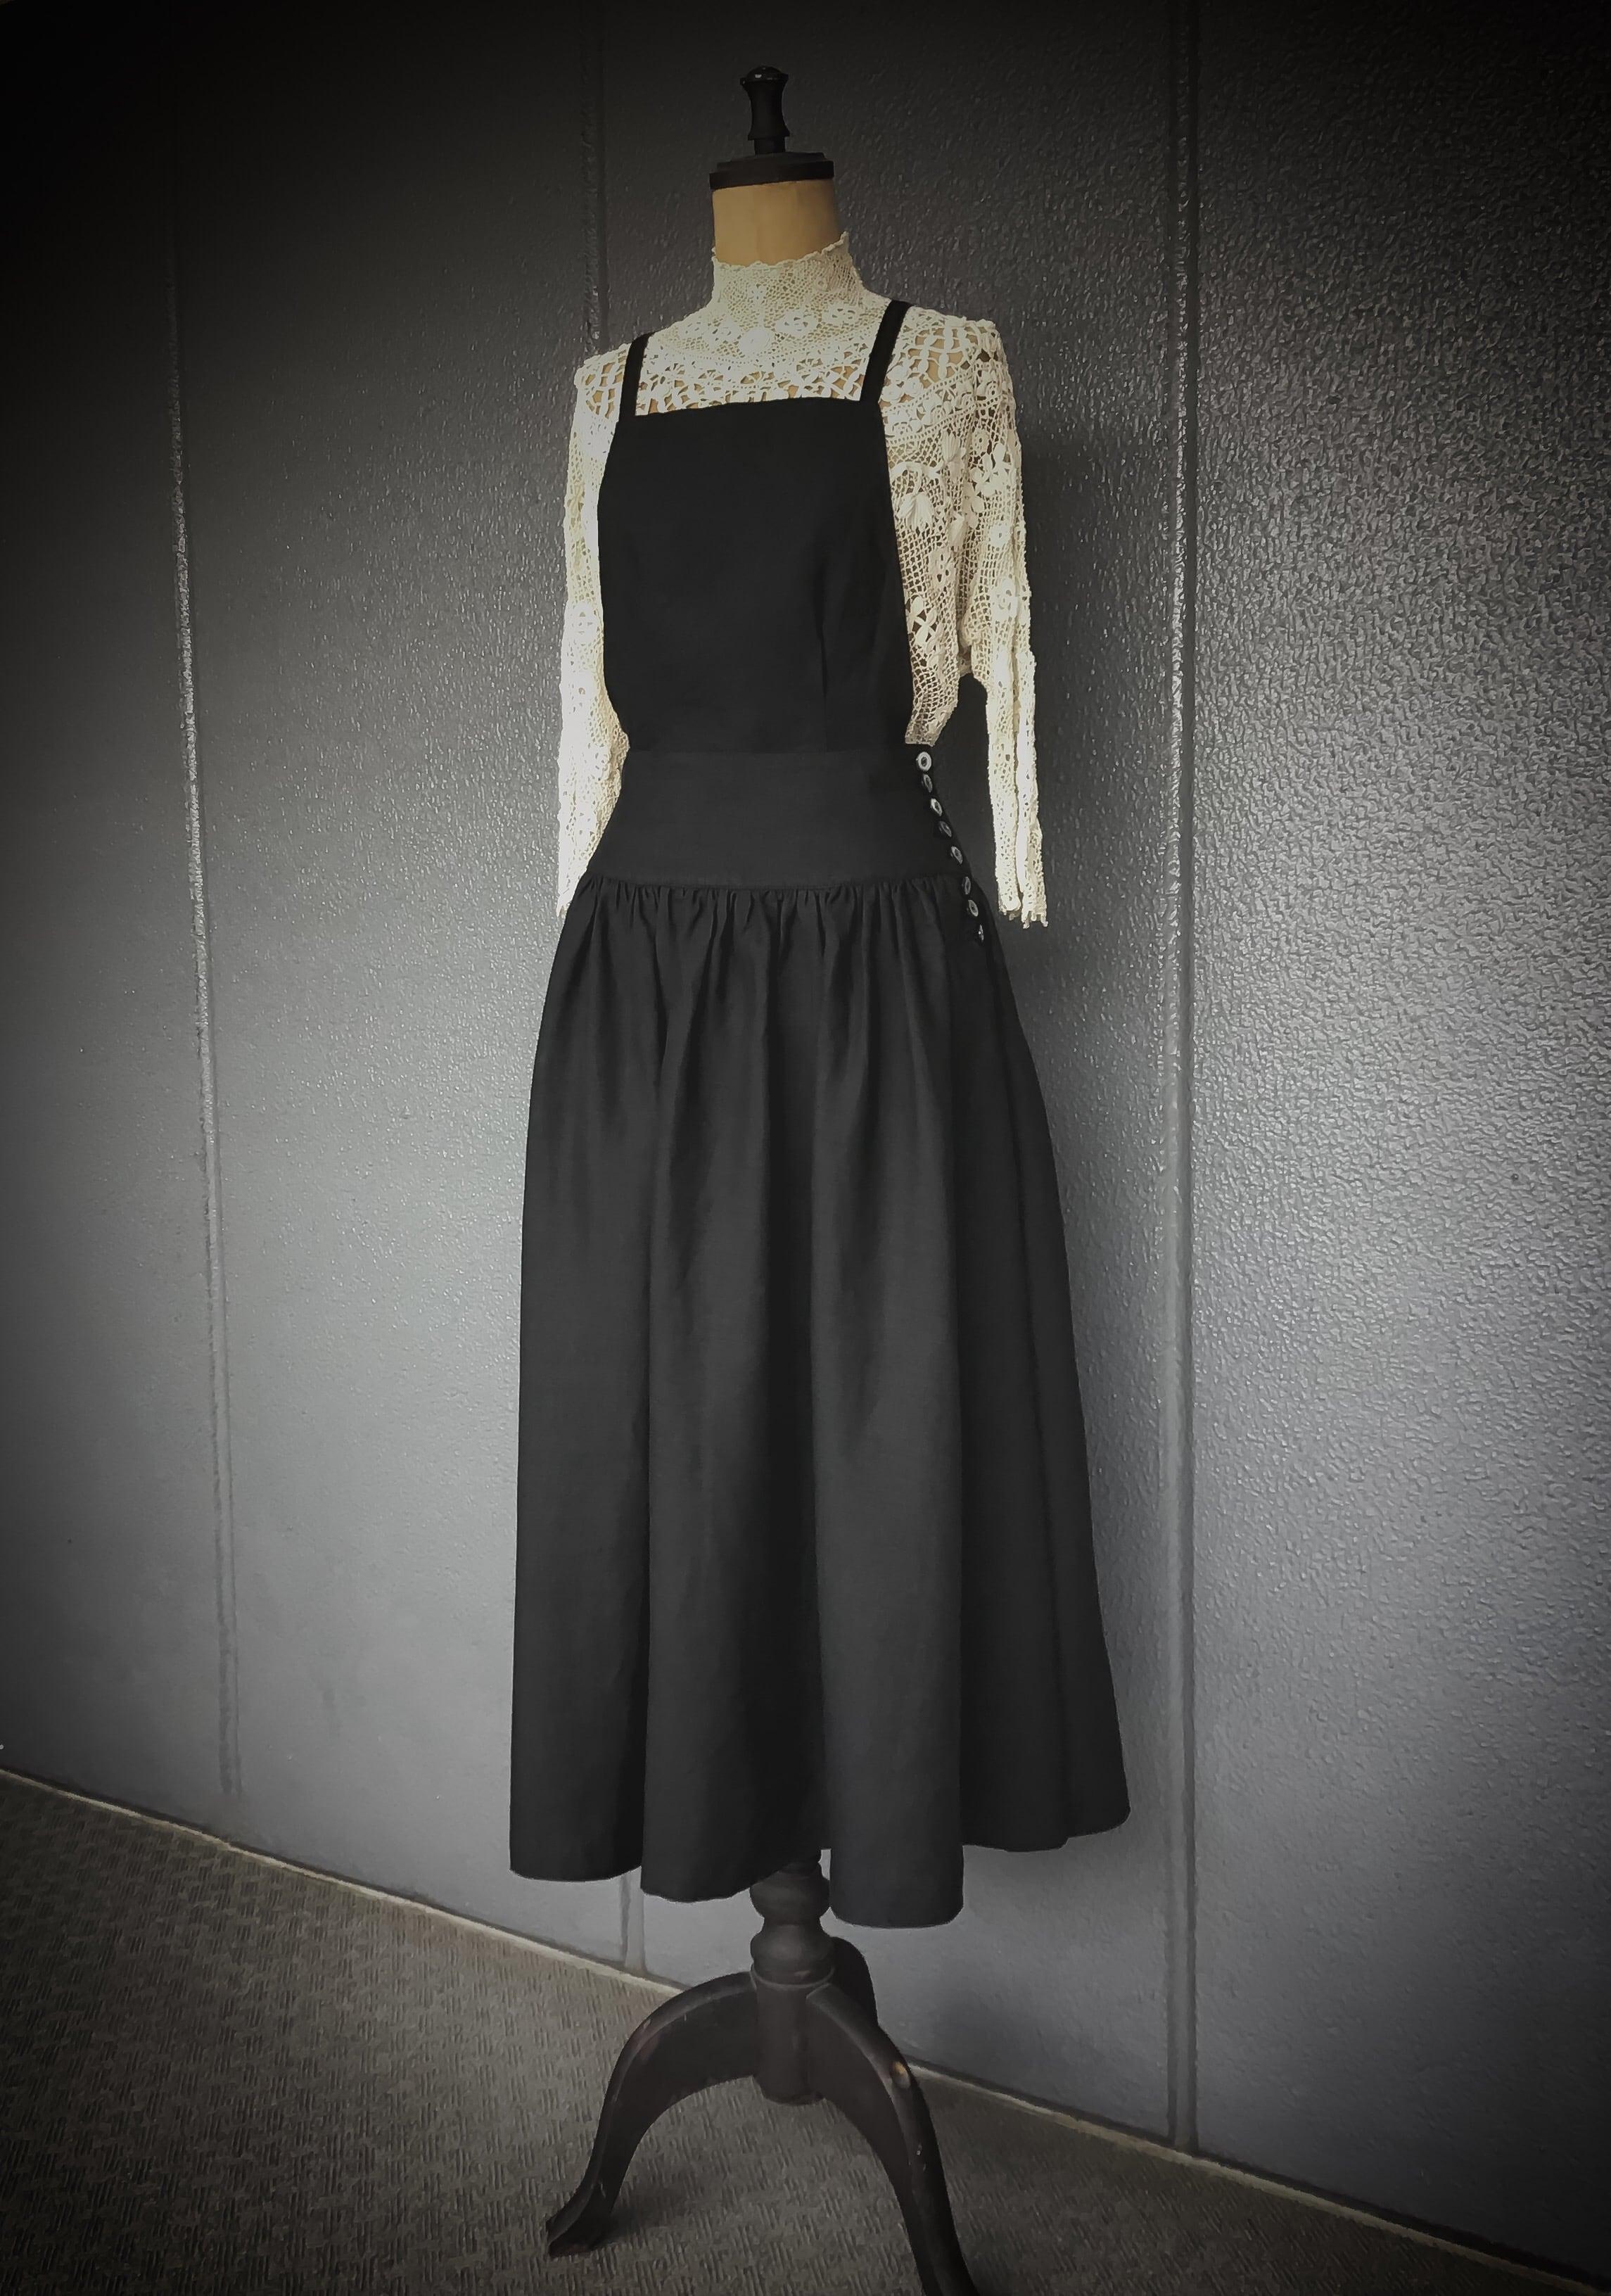 3wey  リネン garçonne  look 《 noir 》 在庫Mサイズのみです。